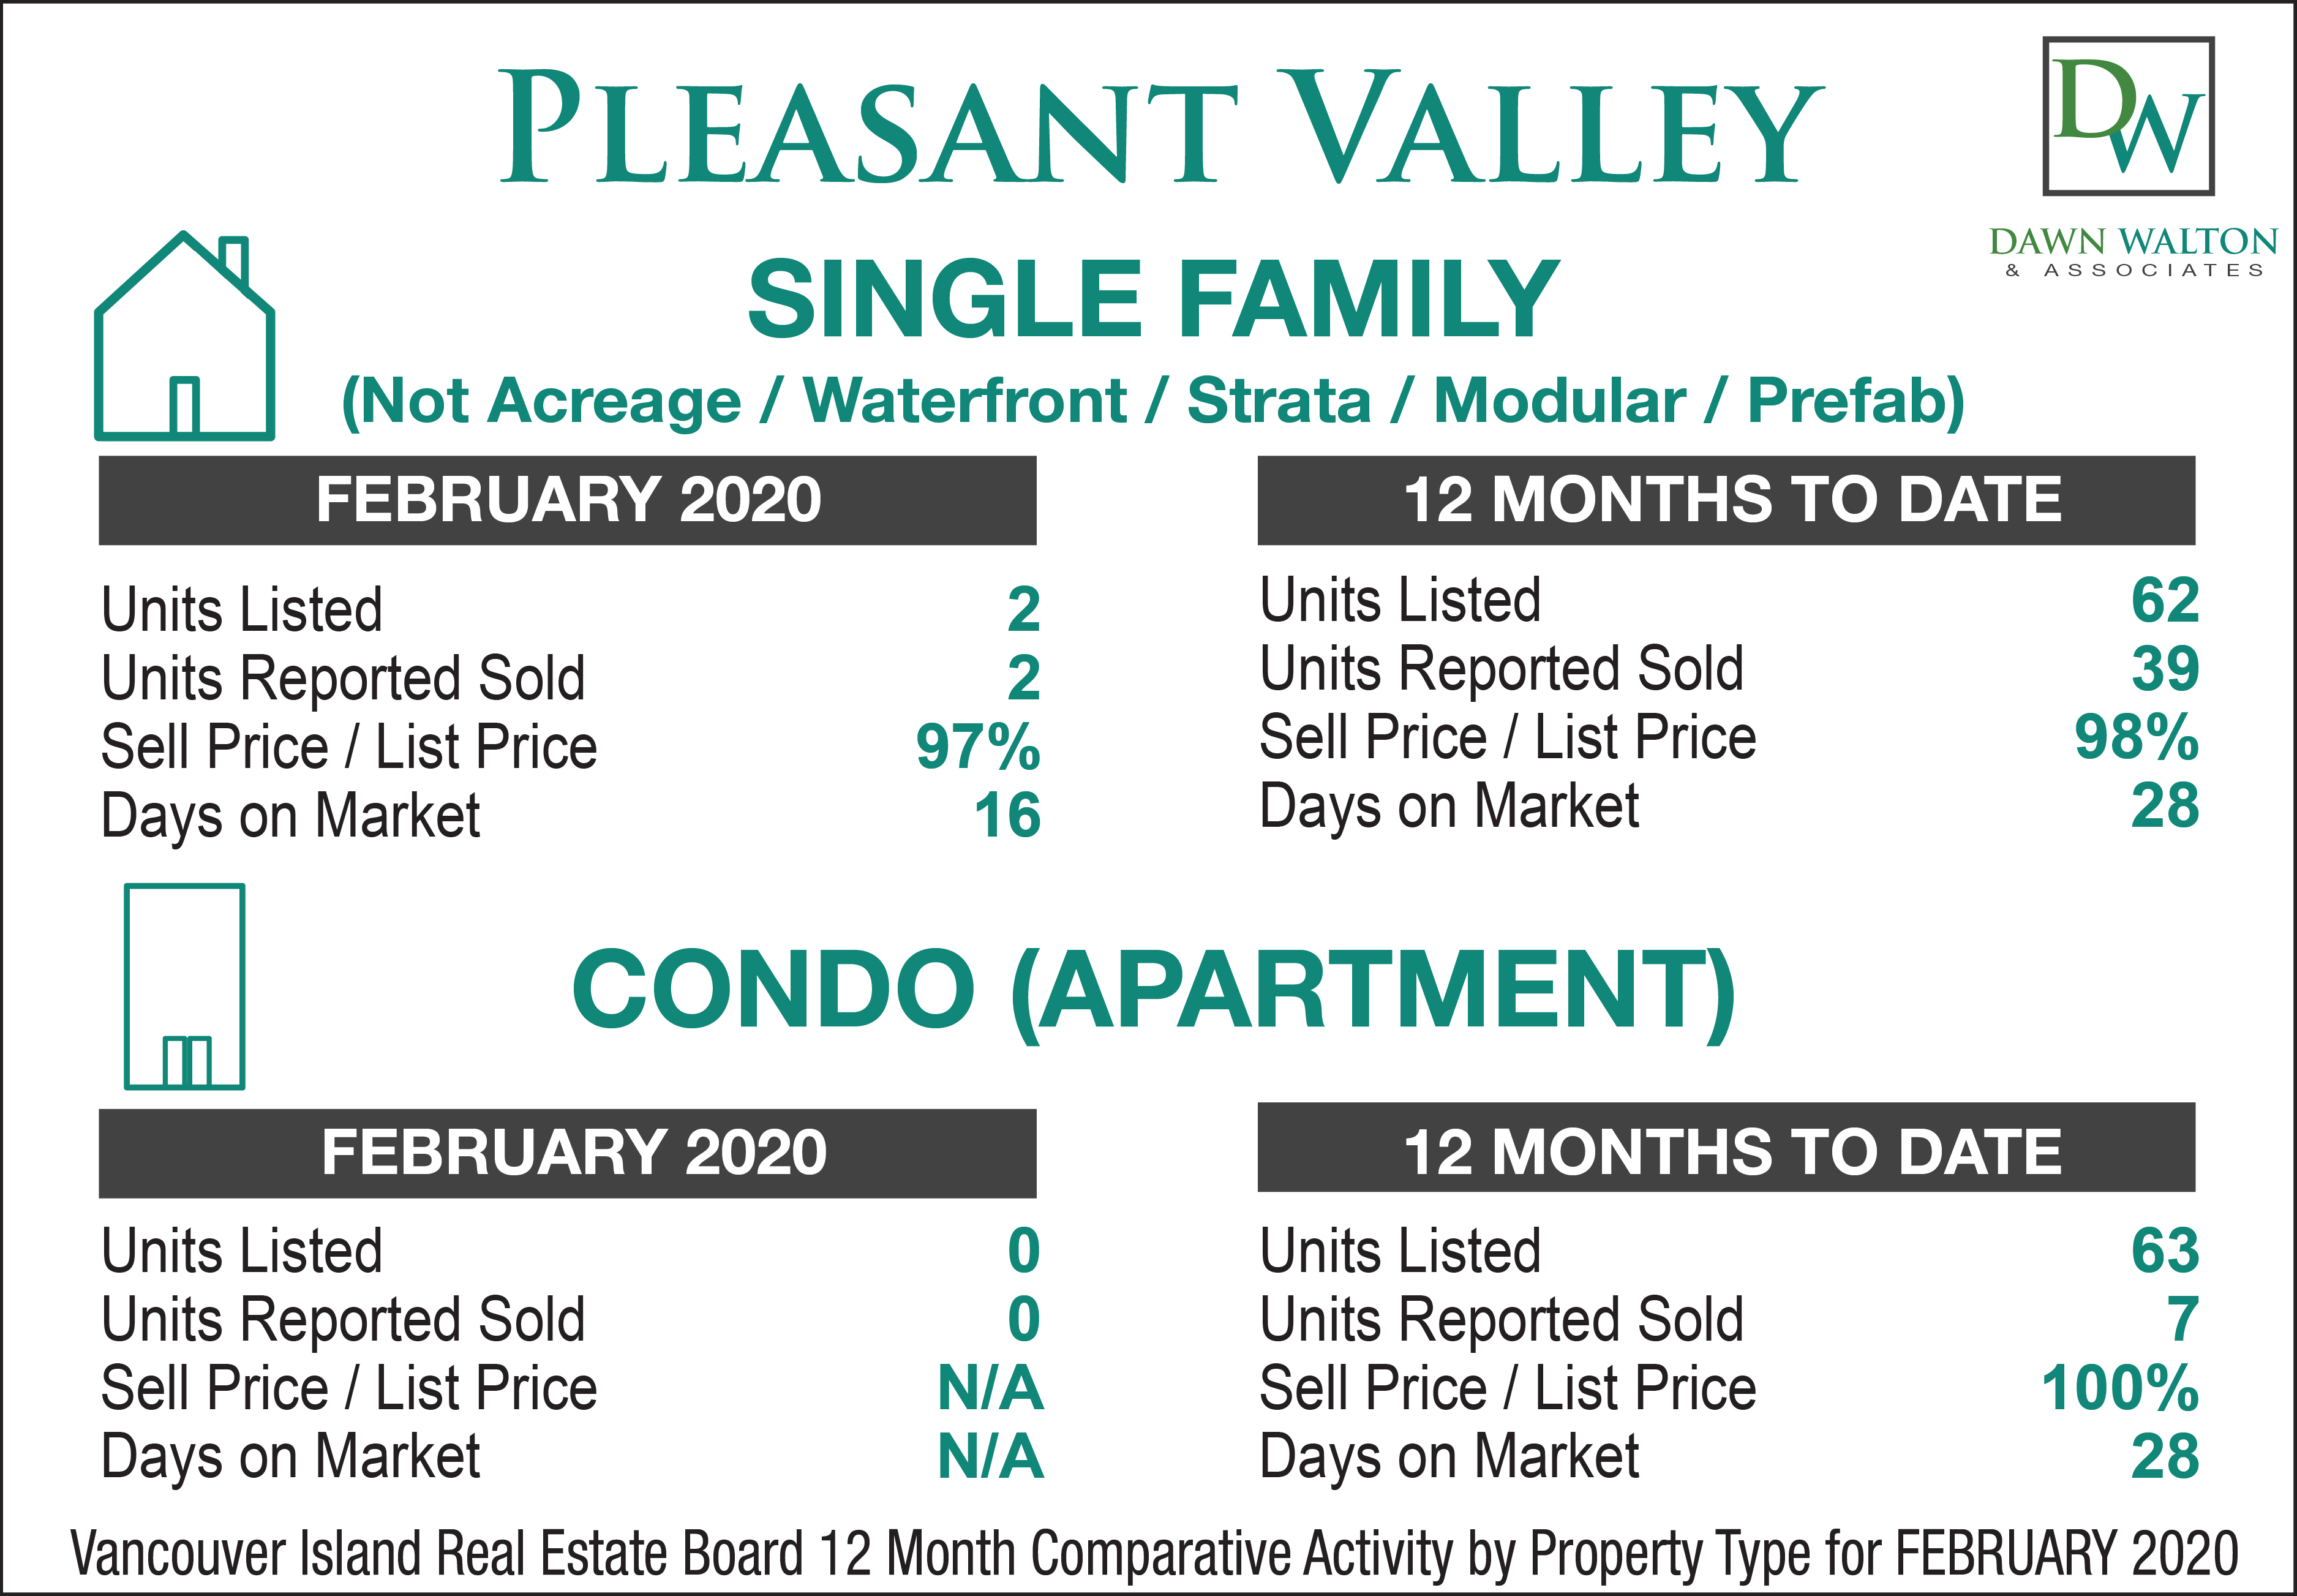 Pleasant Valley Real Estate Market Stats February 2020 - Nanaimo Realtor Dawn Walton